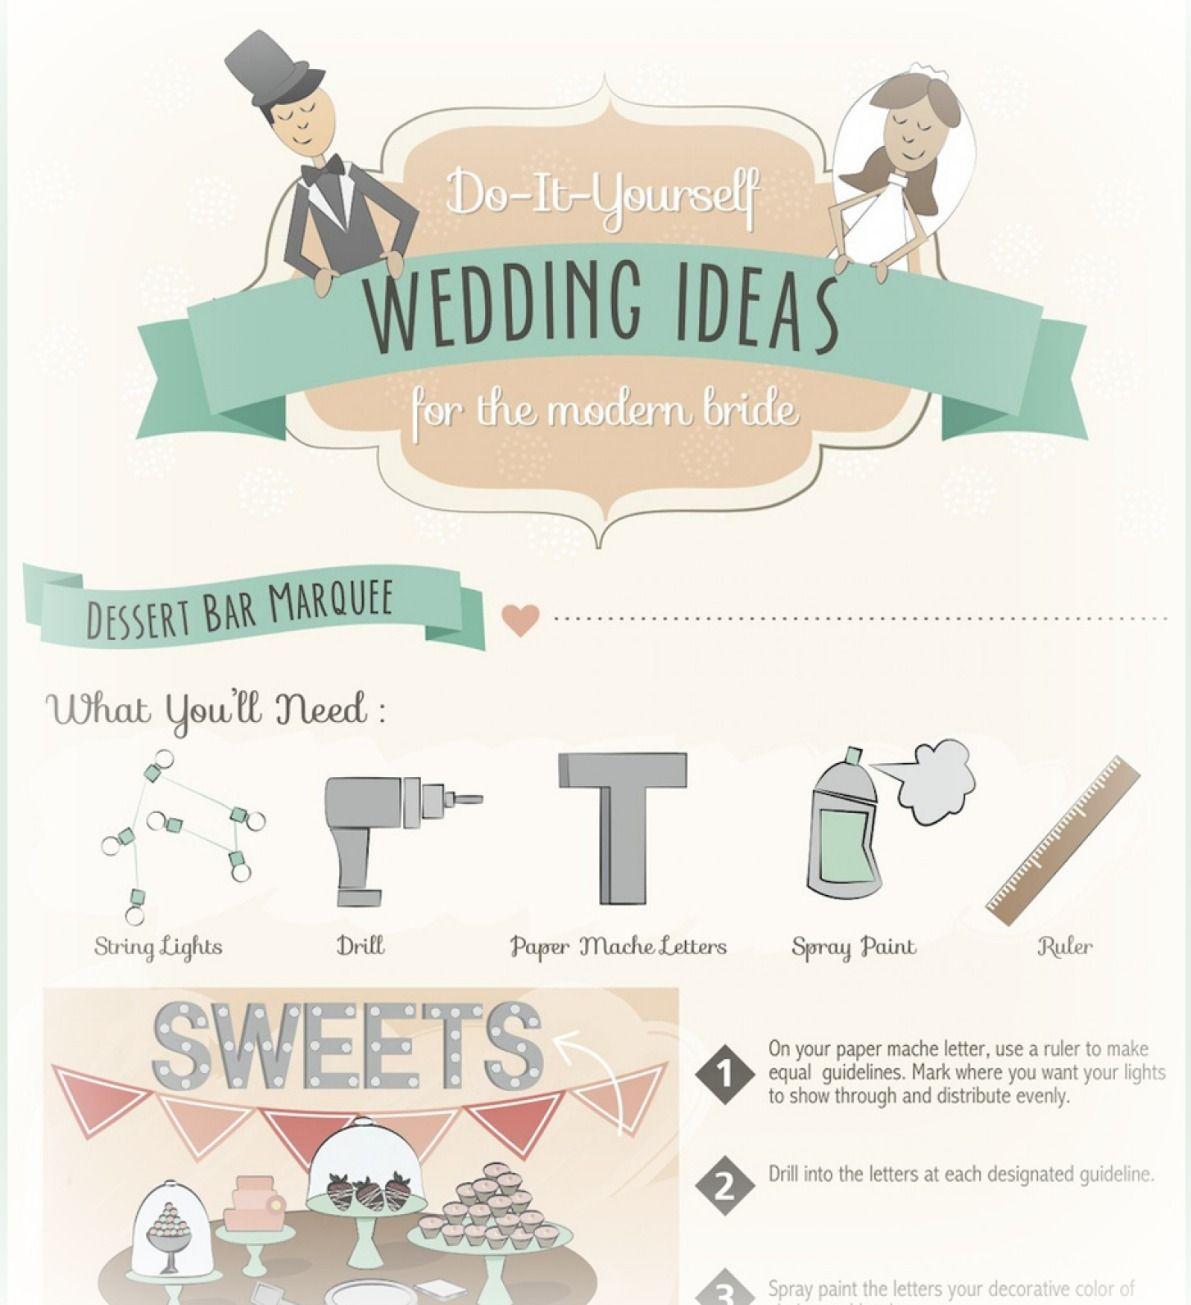 Infographic | Wedding favours diy, Dessert bars and DIY wedding